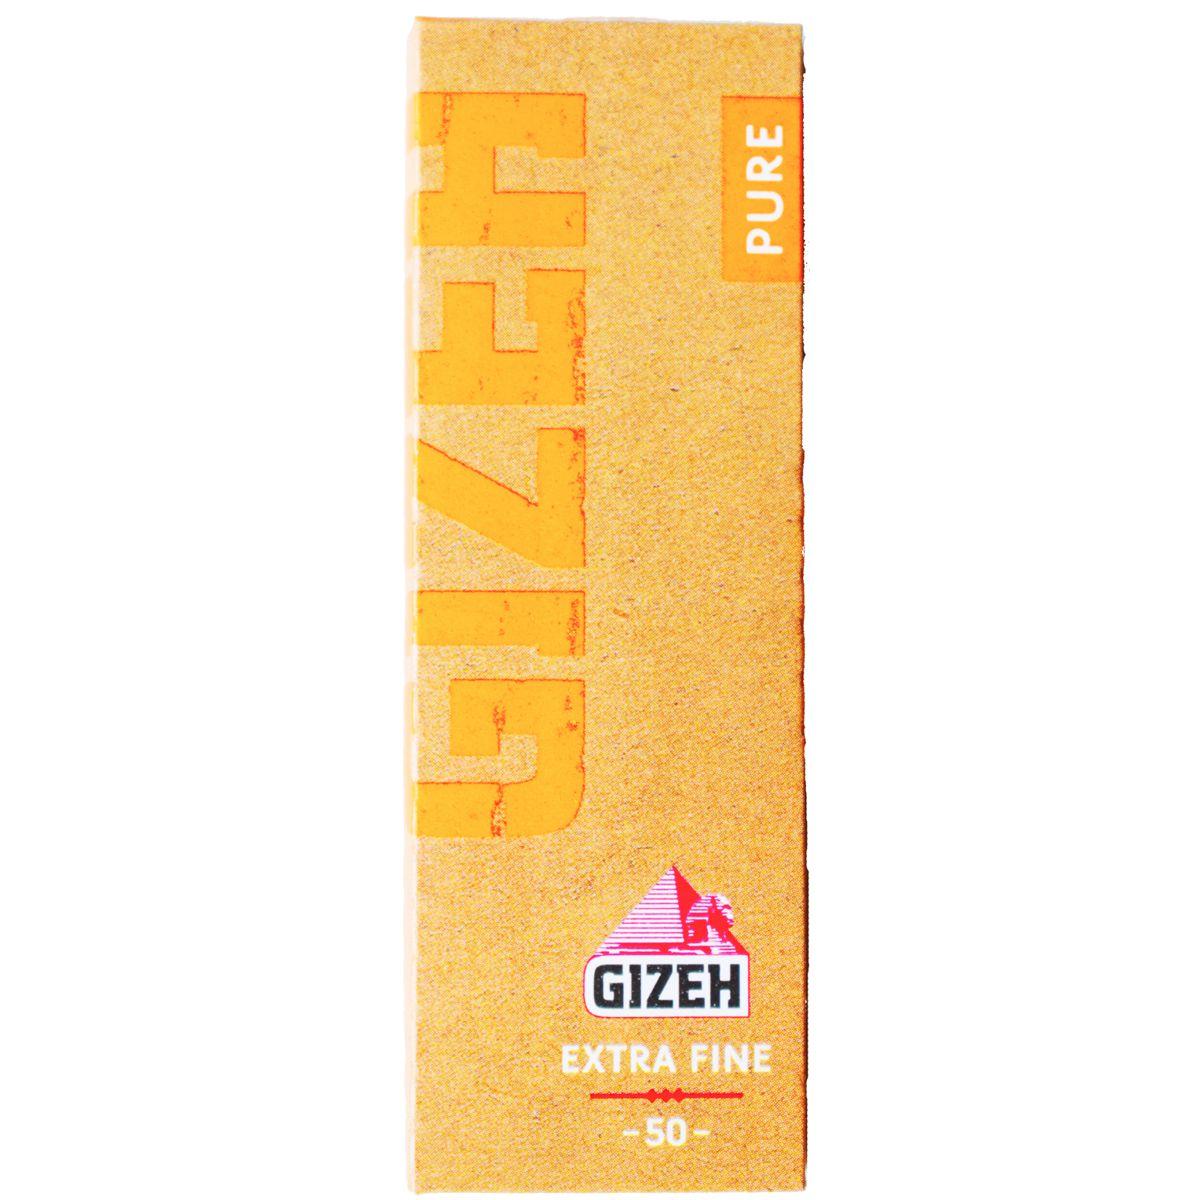 papel hizeh extra fino organico 70 precio